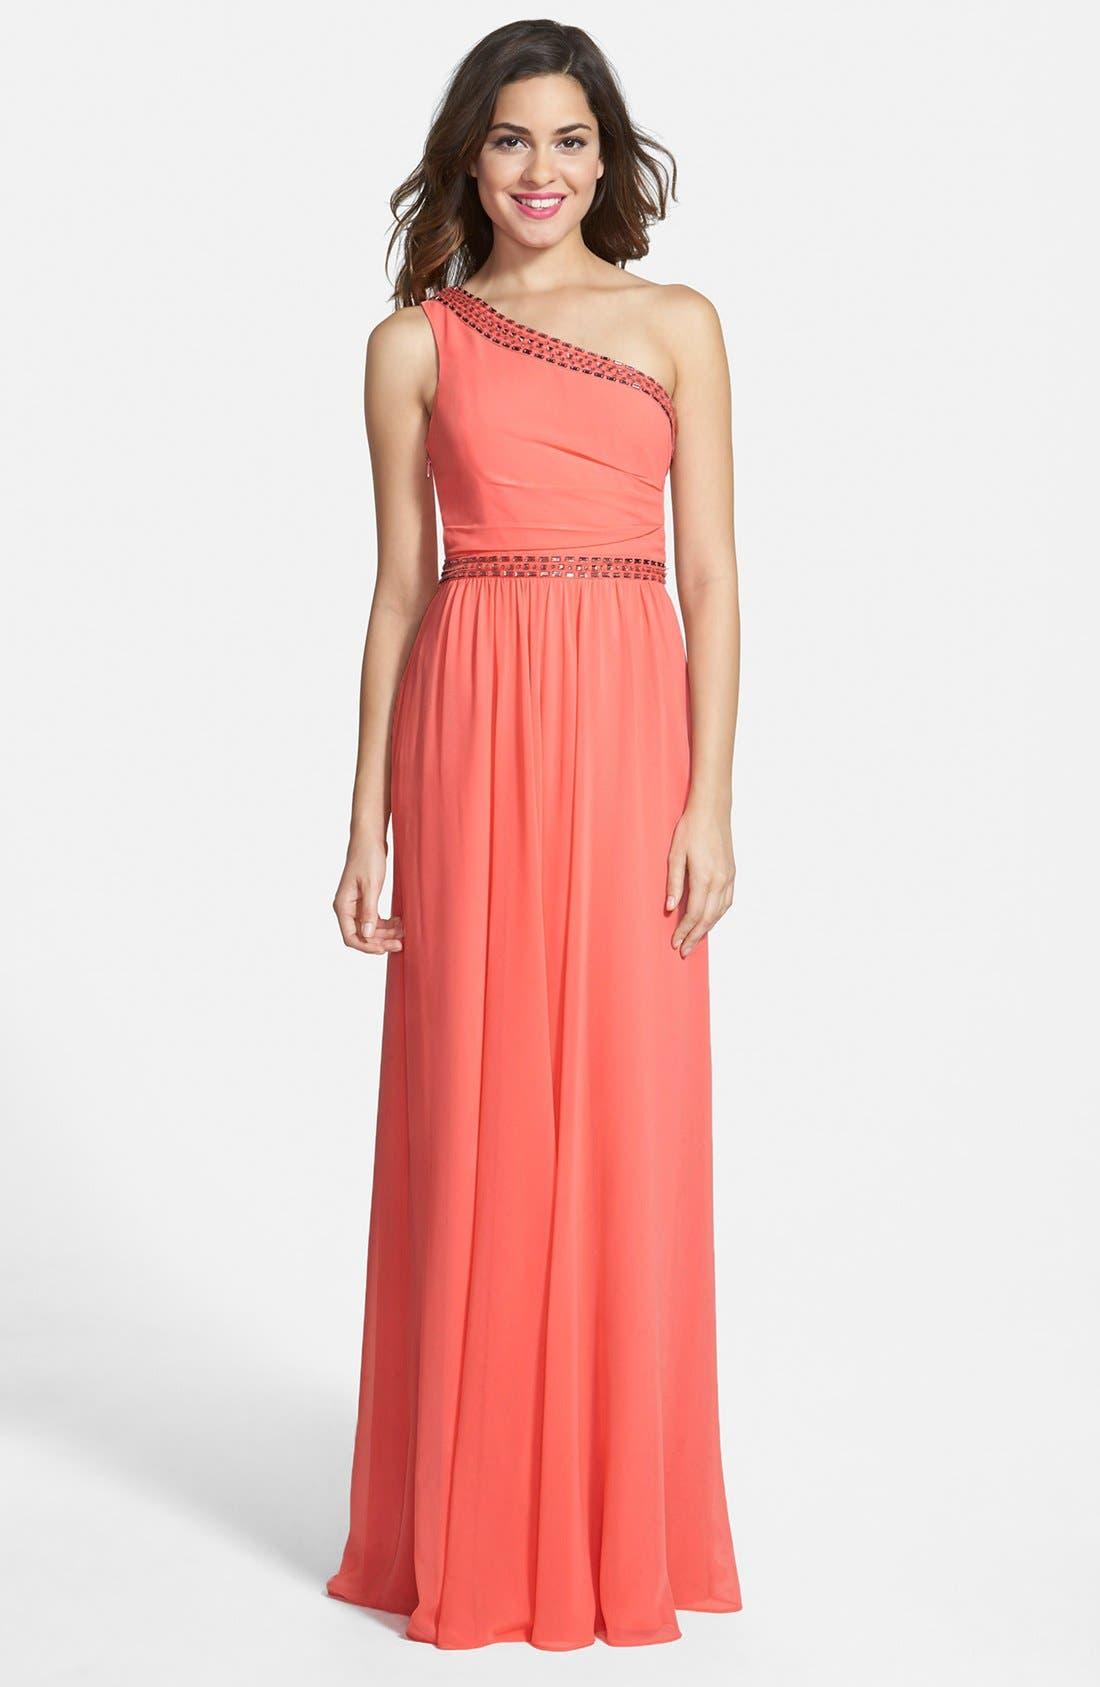 Main Image - BCBGMAXAZRIA 'Daniele' Embellished One-Shoulder Georgette Gown